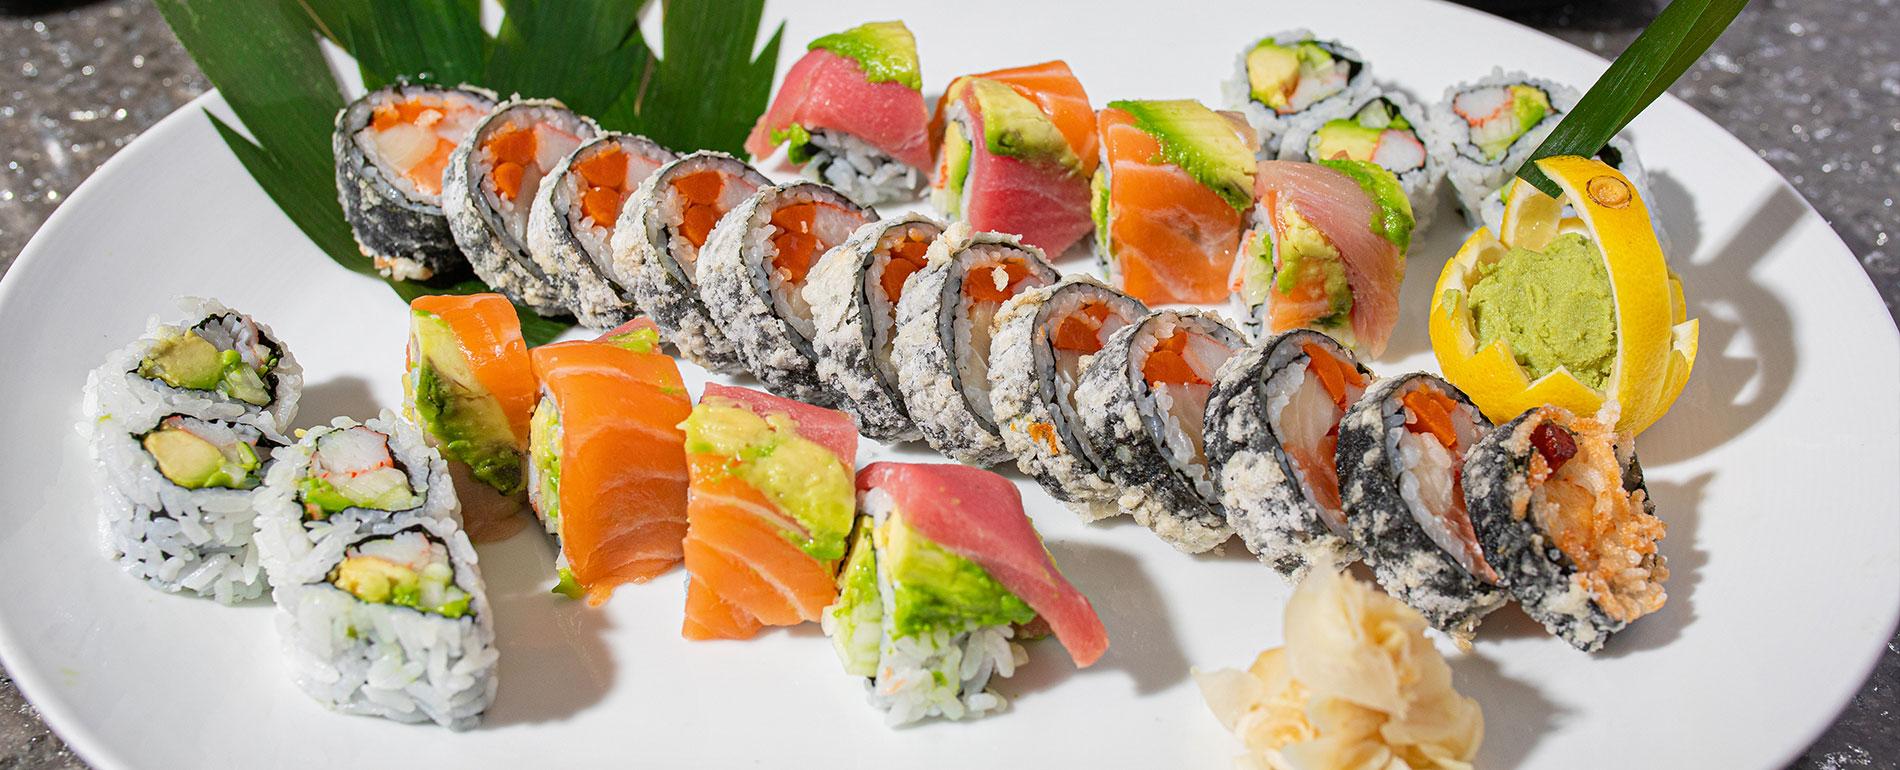 pocono asian cuisine - lucky 8 sushi